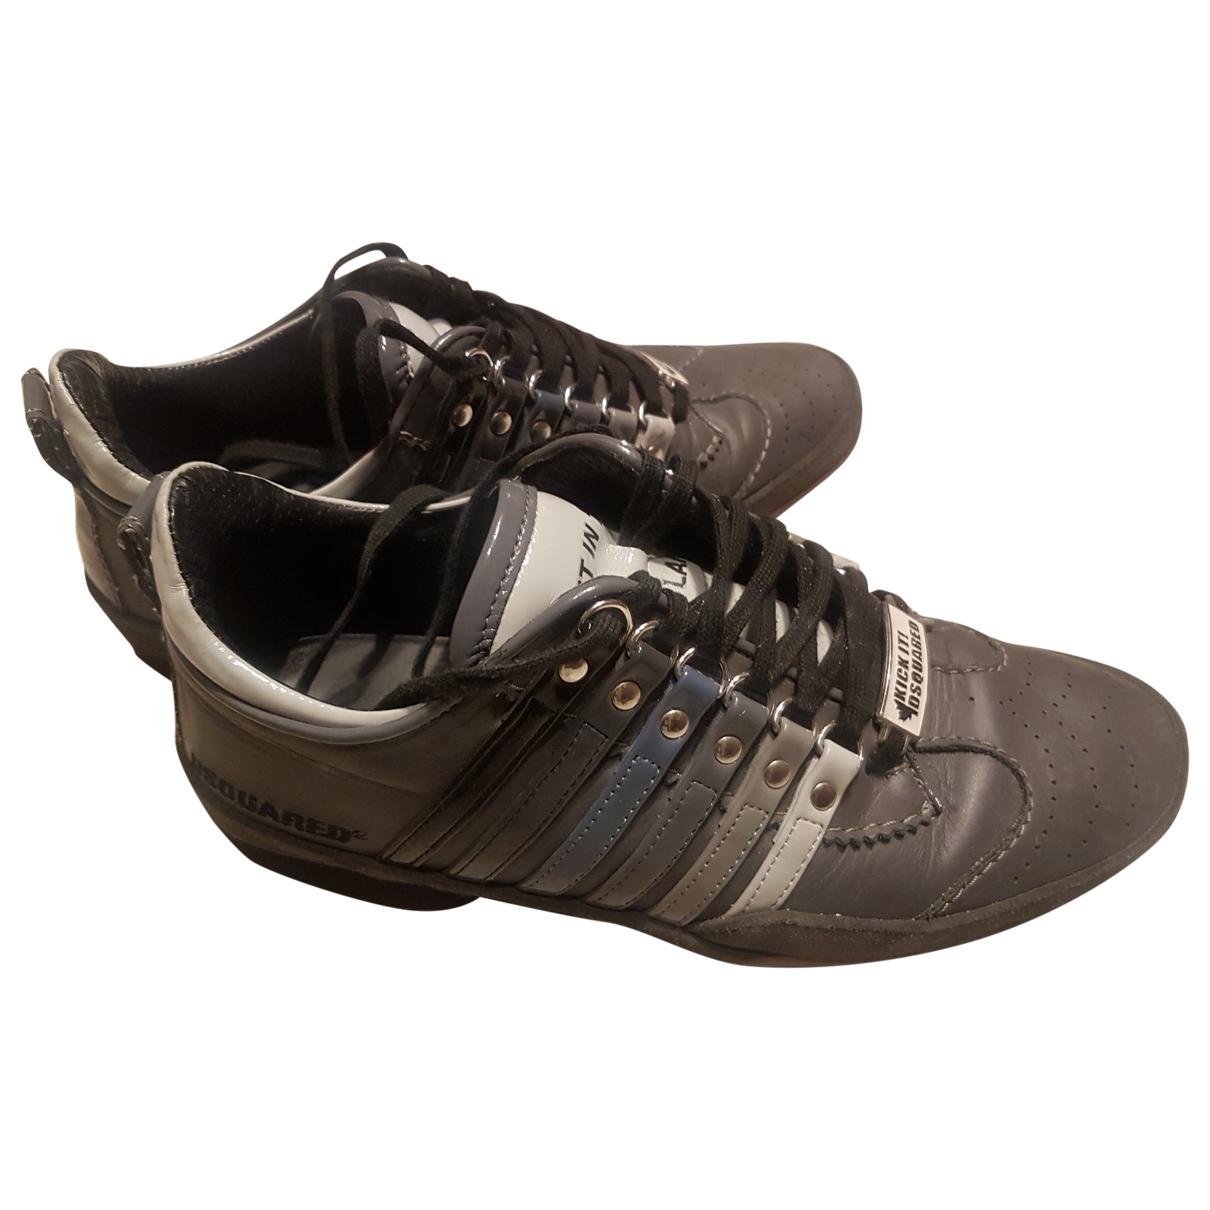 Dsquared2 \N Sneakers in  Anthrazit Leder